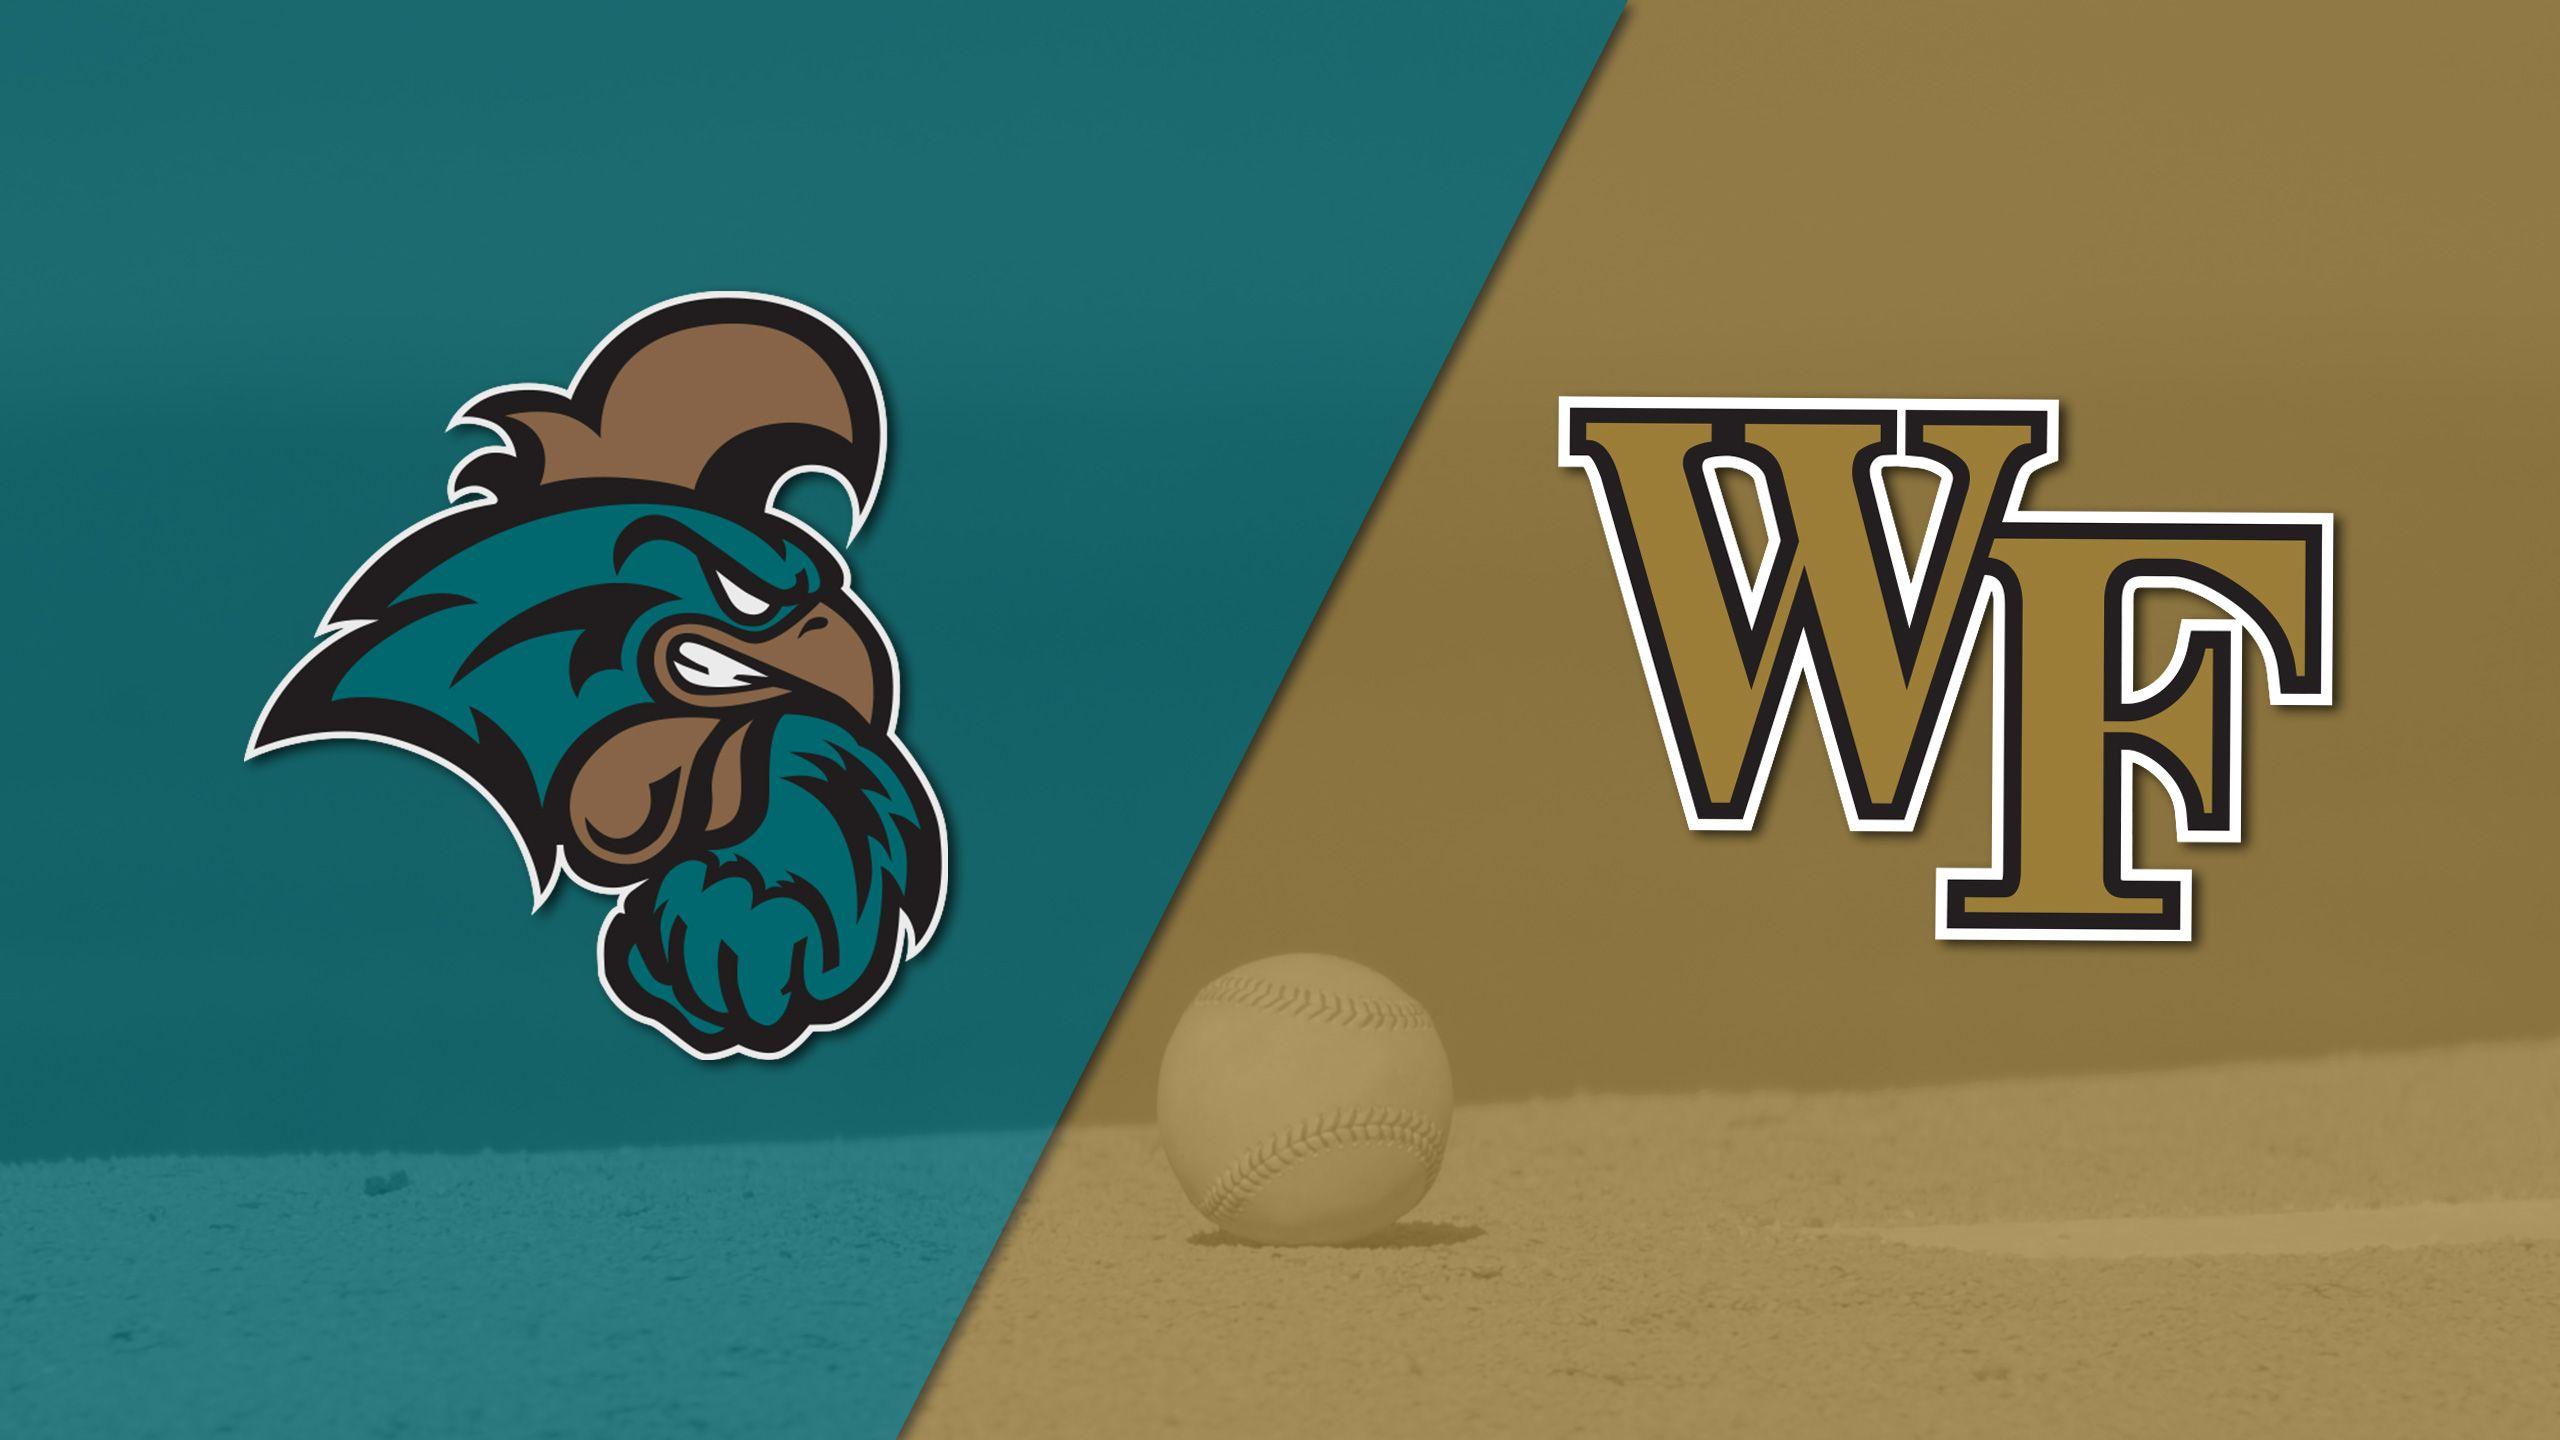 Coastal Carolina vs. #22 Wake Forest (Baseball)